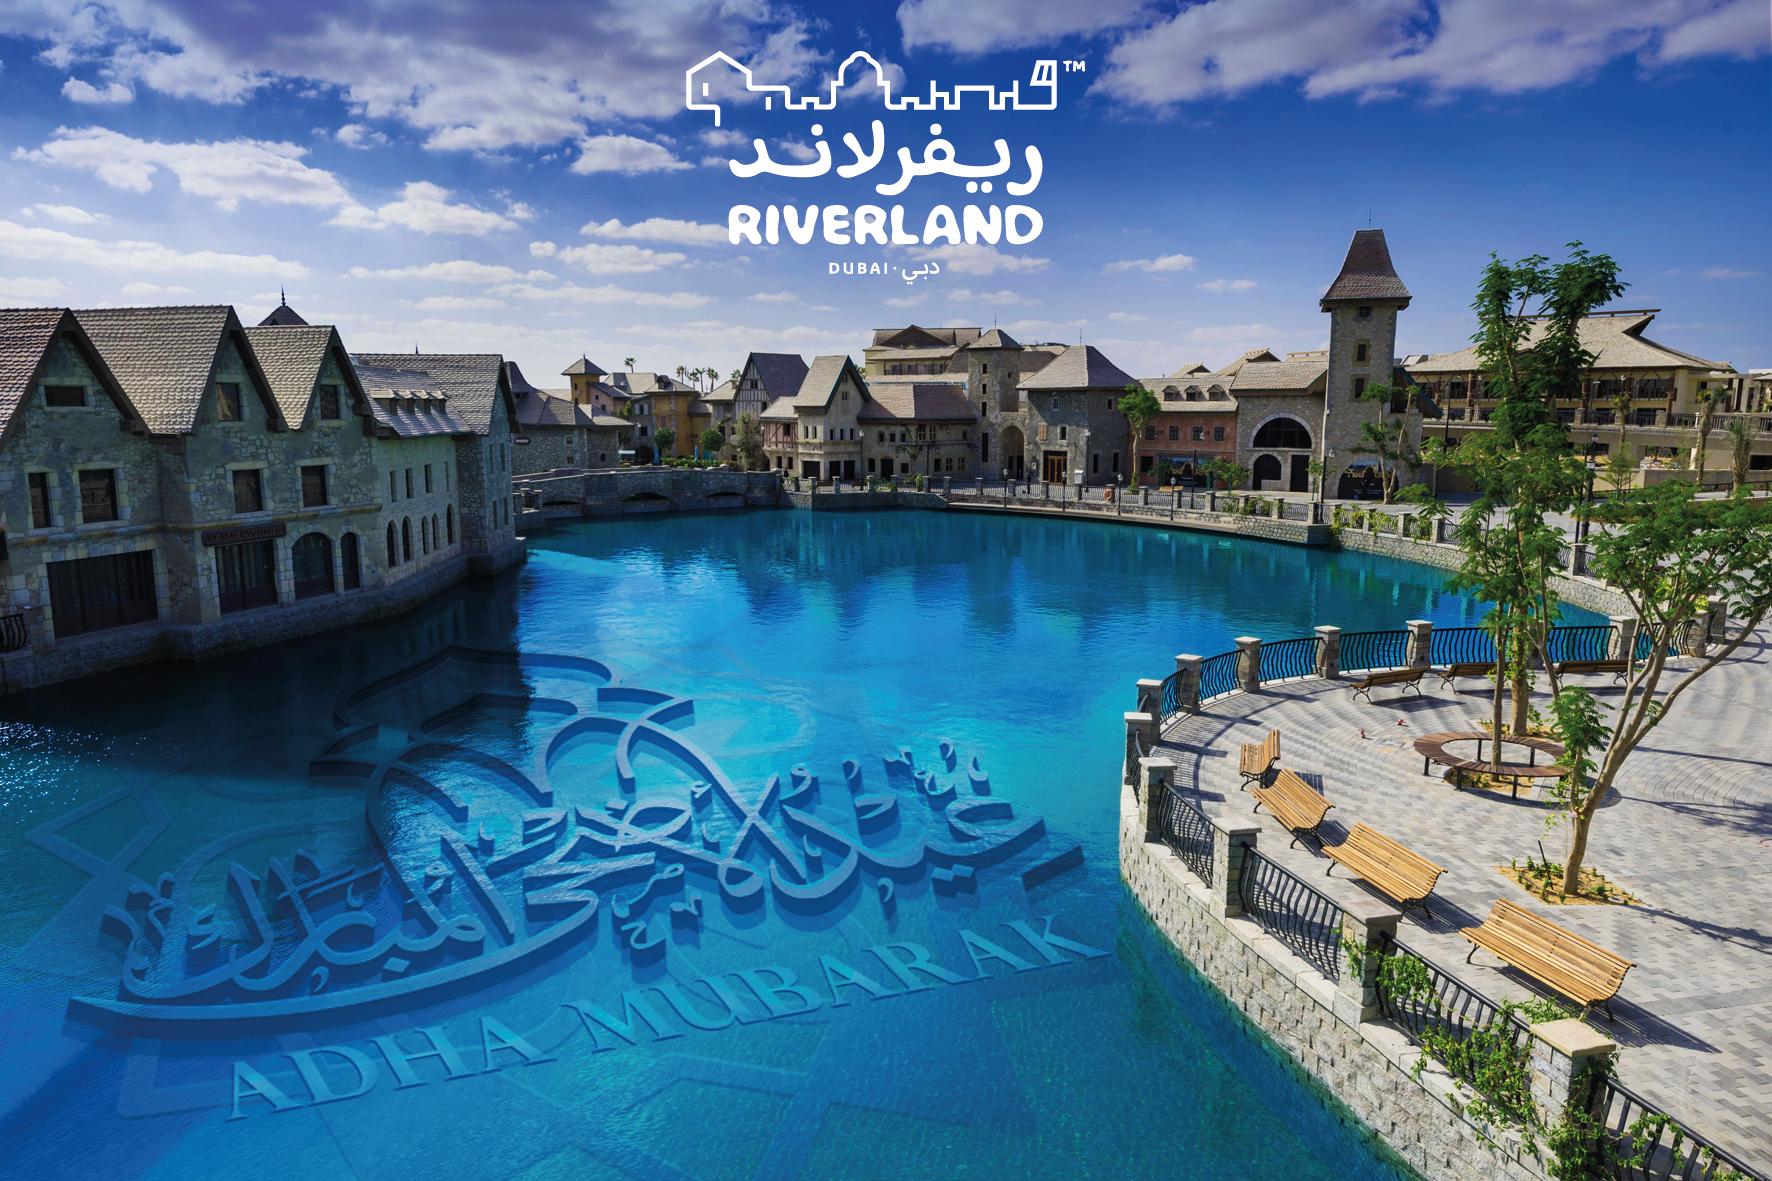 Celebrate EID-AL-ADHA with Riverland™ Dubai at Dubai Parks And Resorts